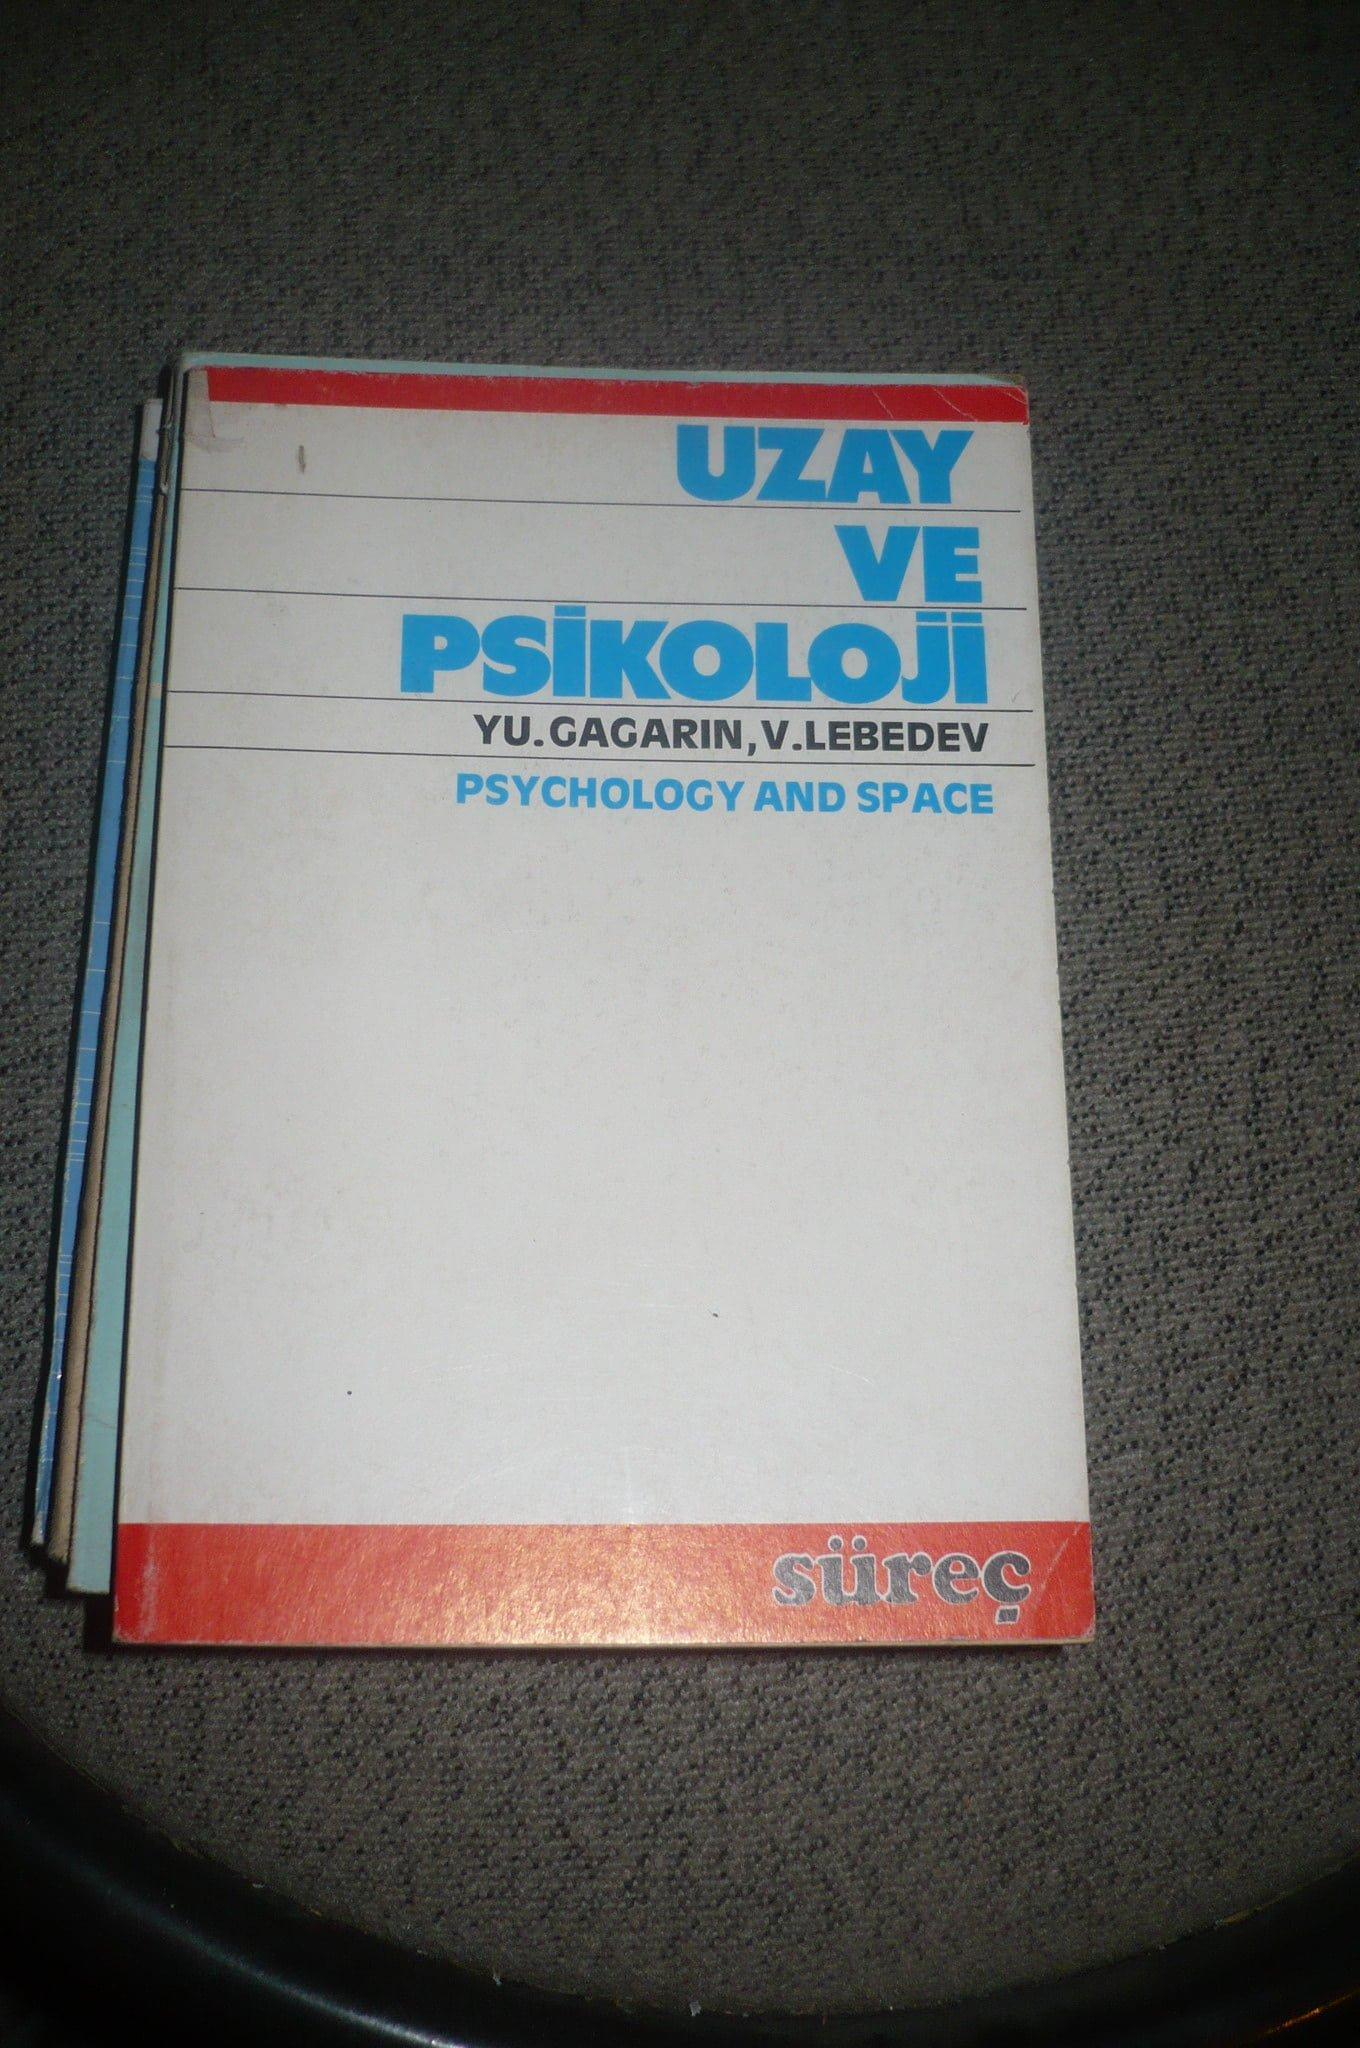 UZAY VE PSİKOLOJİ/Y.Gagarin,V.Lebedev /15 TL